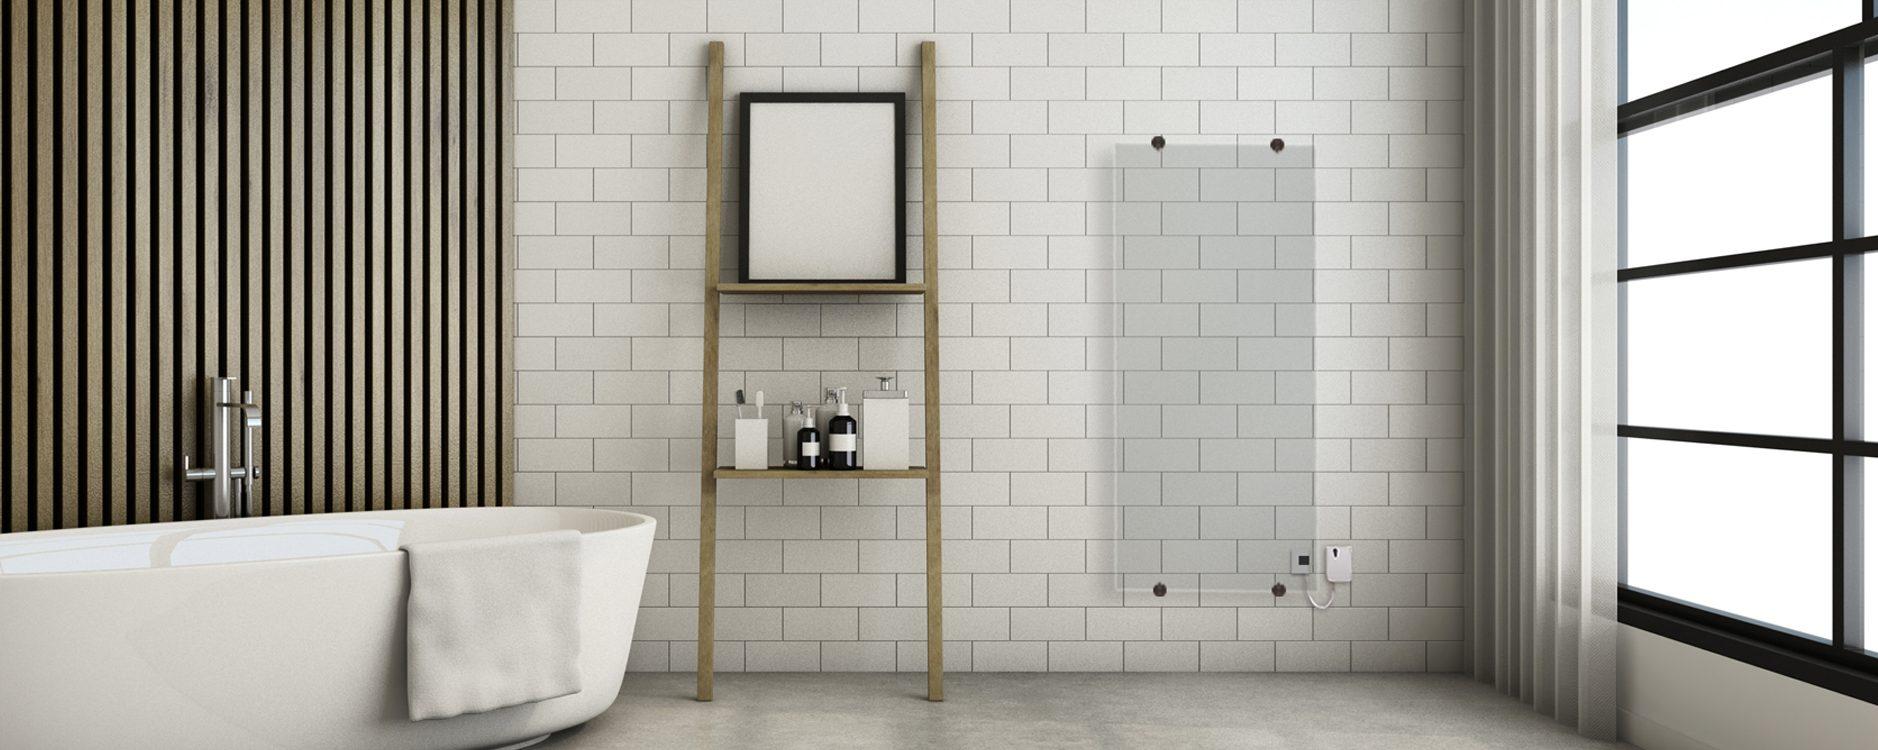 Bathroom clear